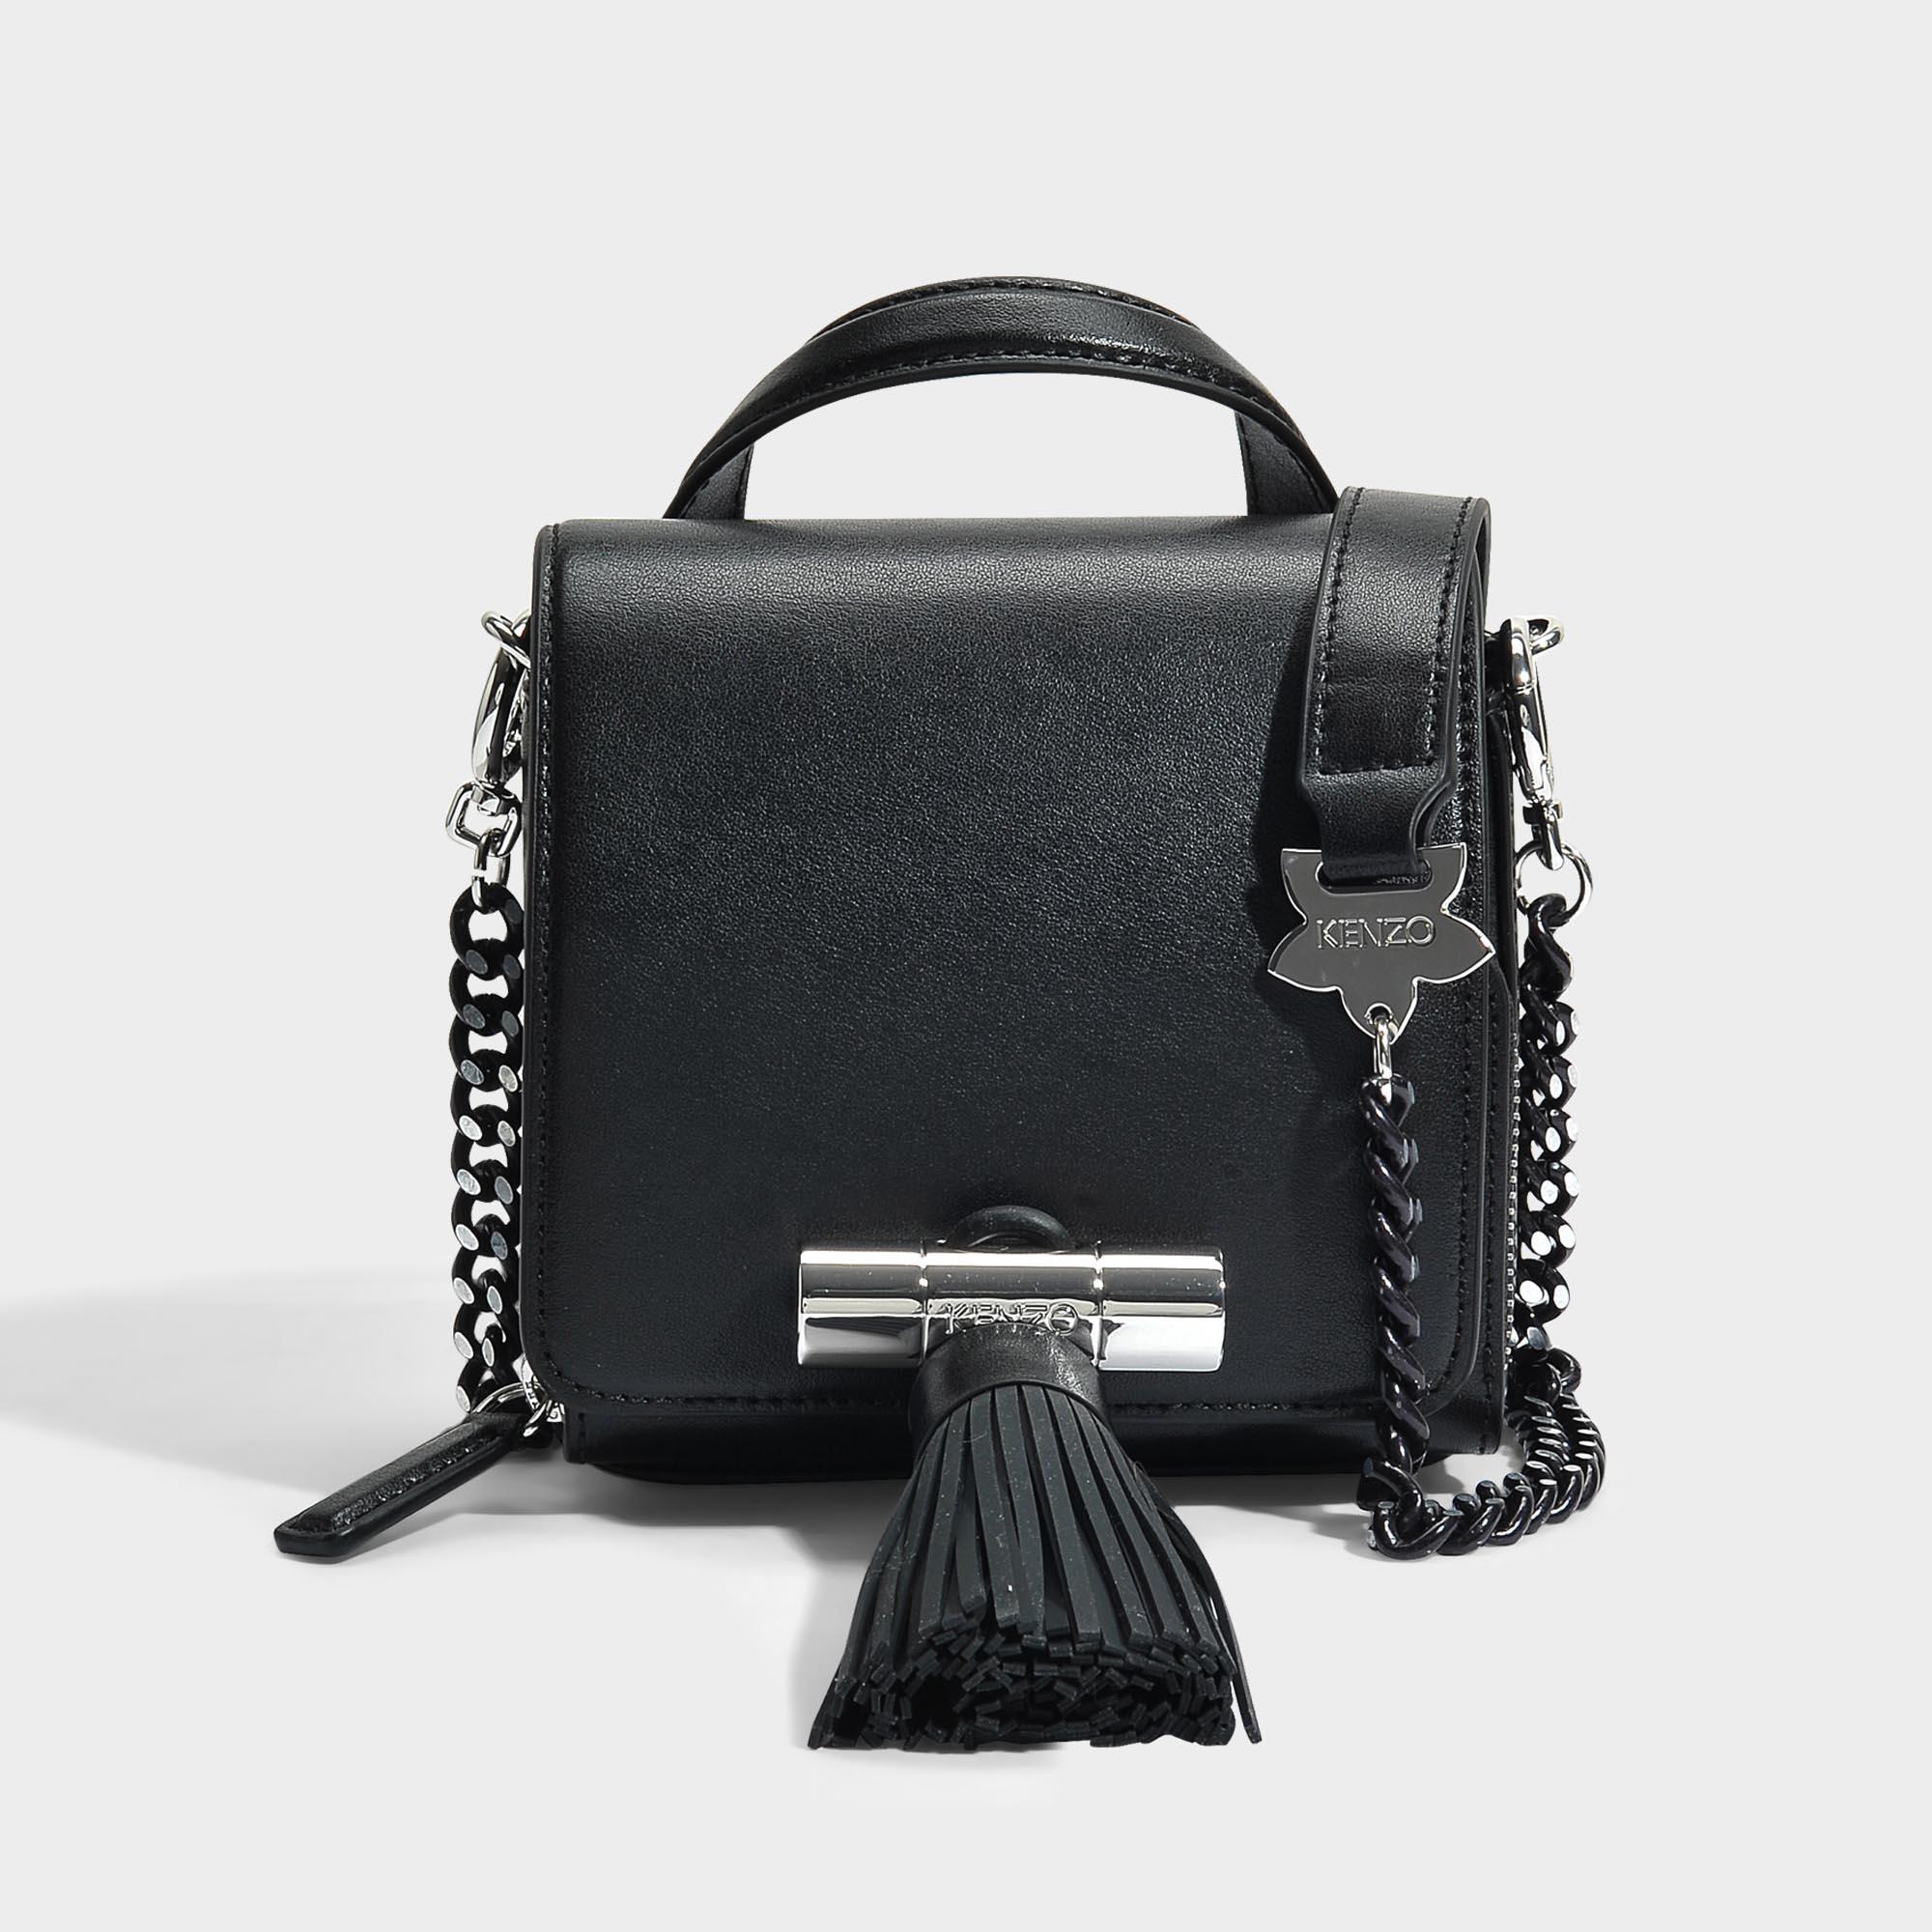 Kenzo Chaîne Marin Mini-sac À Poignée En Cuir Noir F1HcwD